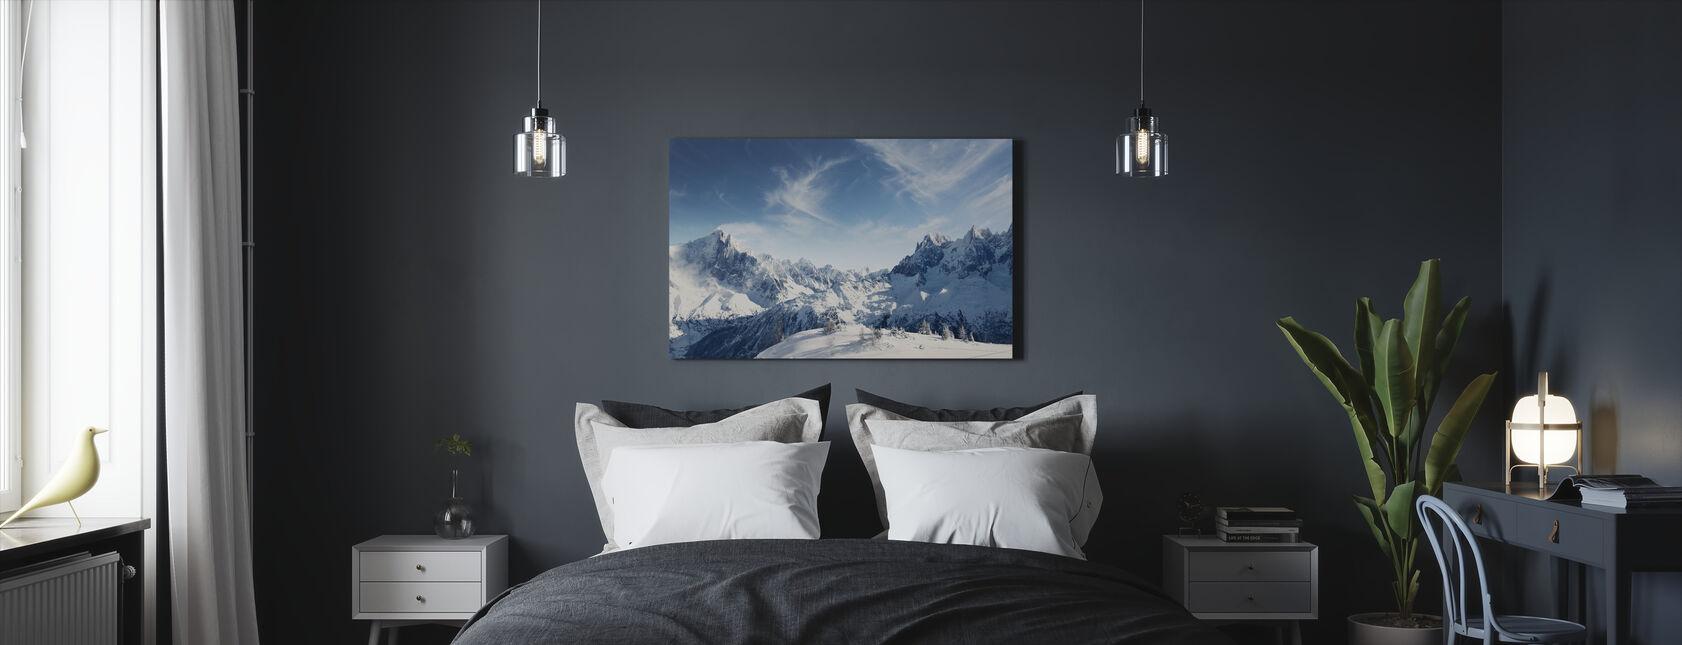 Sunny Alps in Chamonix - Canvas print - Bedroom